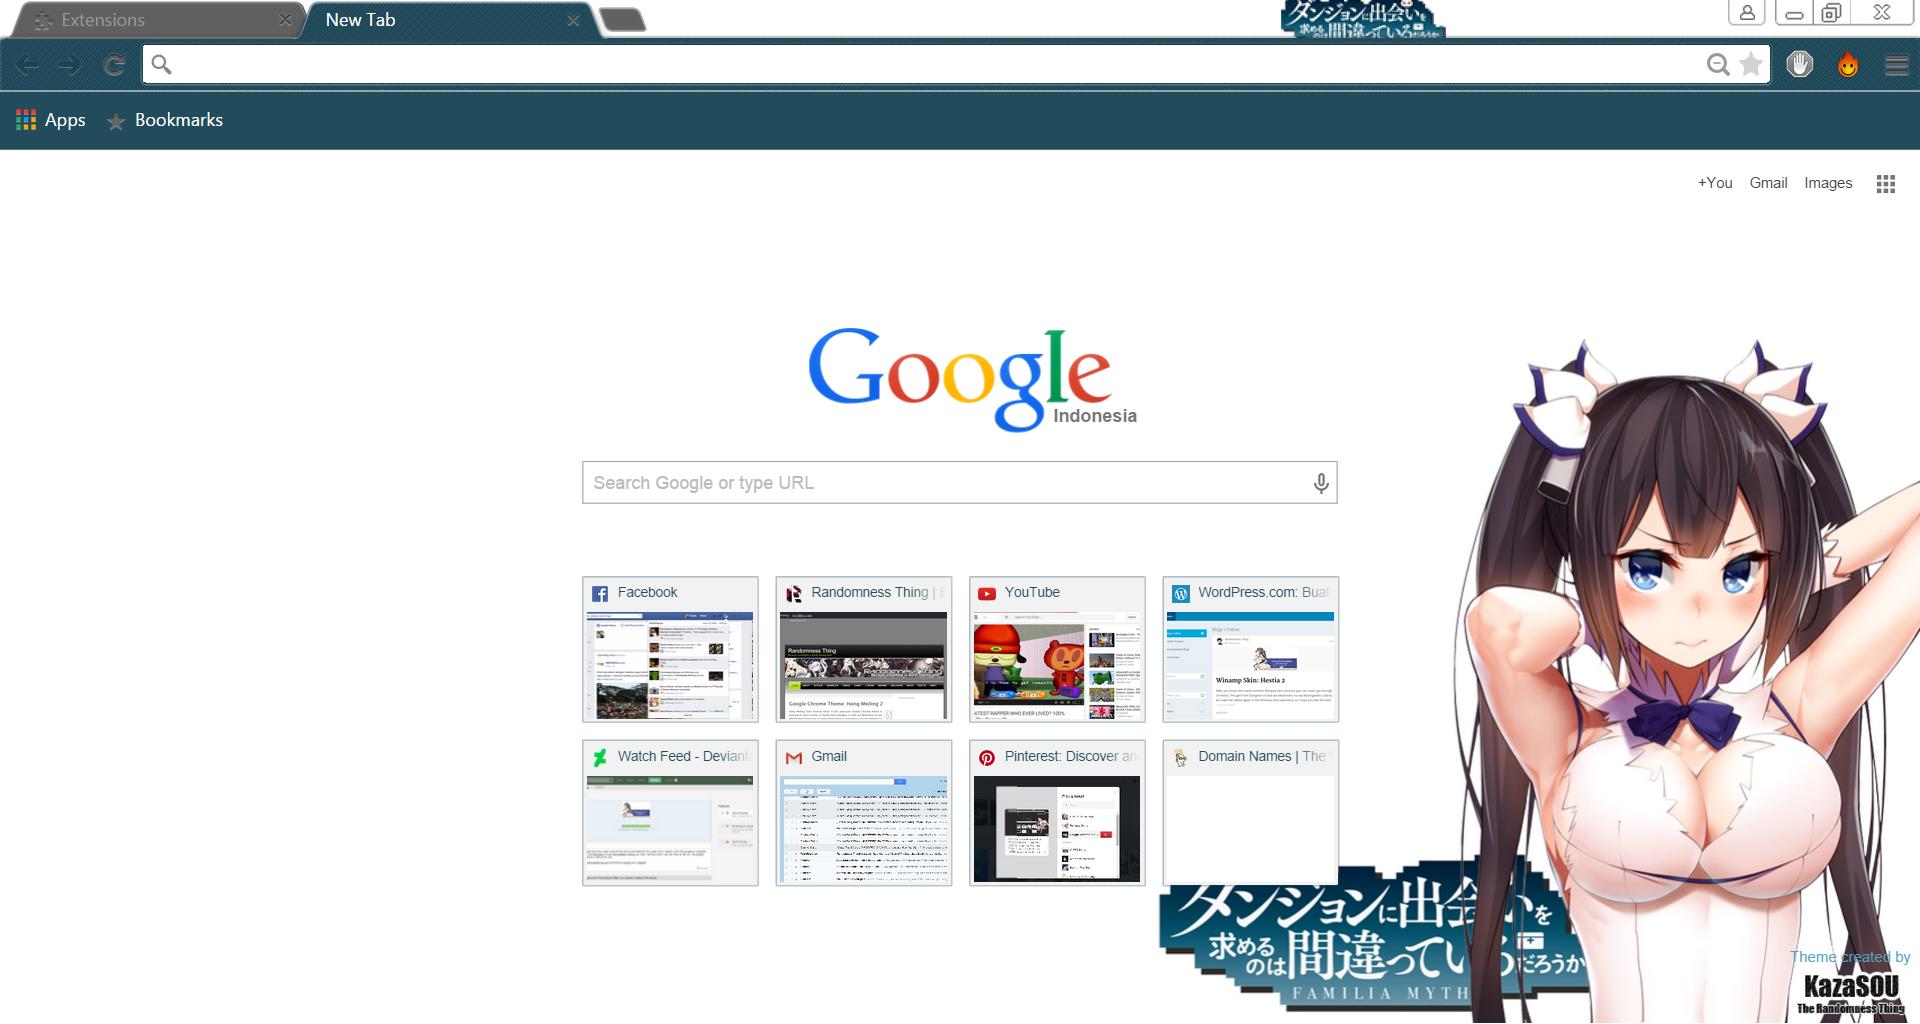 Google themes today - Hestia_chrome3